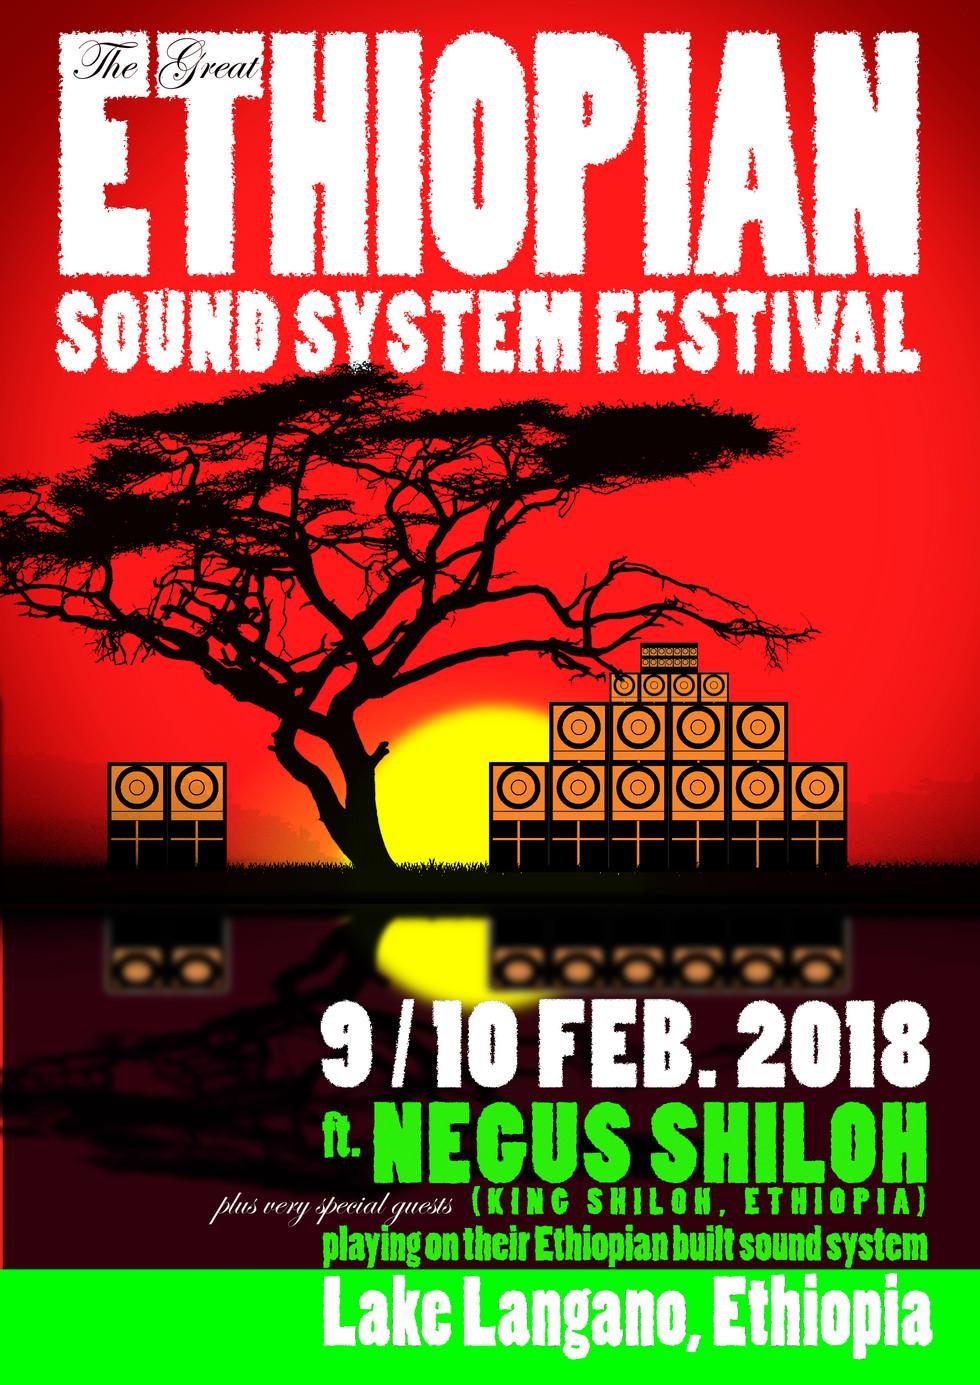 King Shiloh presents: The Great Ethiopian Soundsystem  Festival!